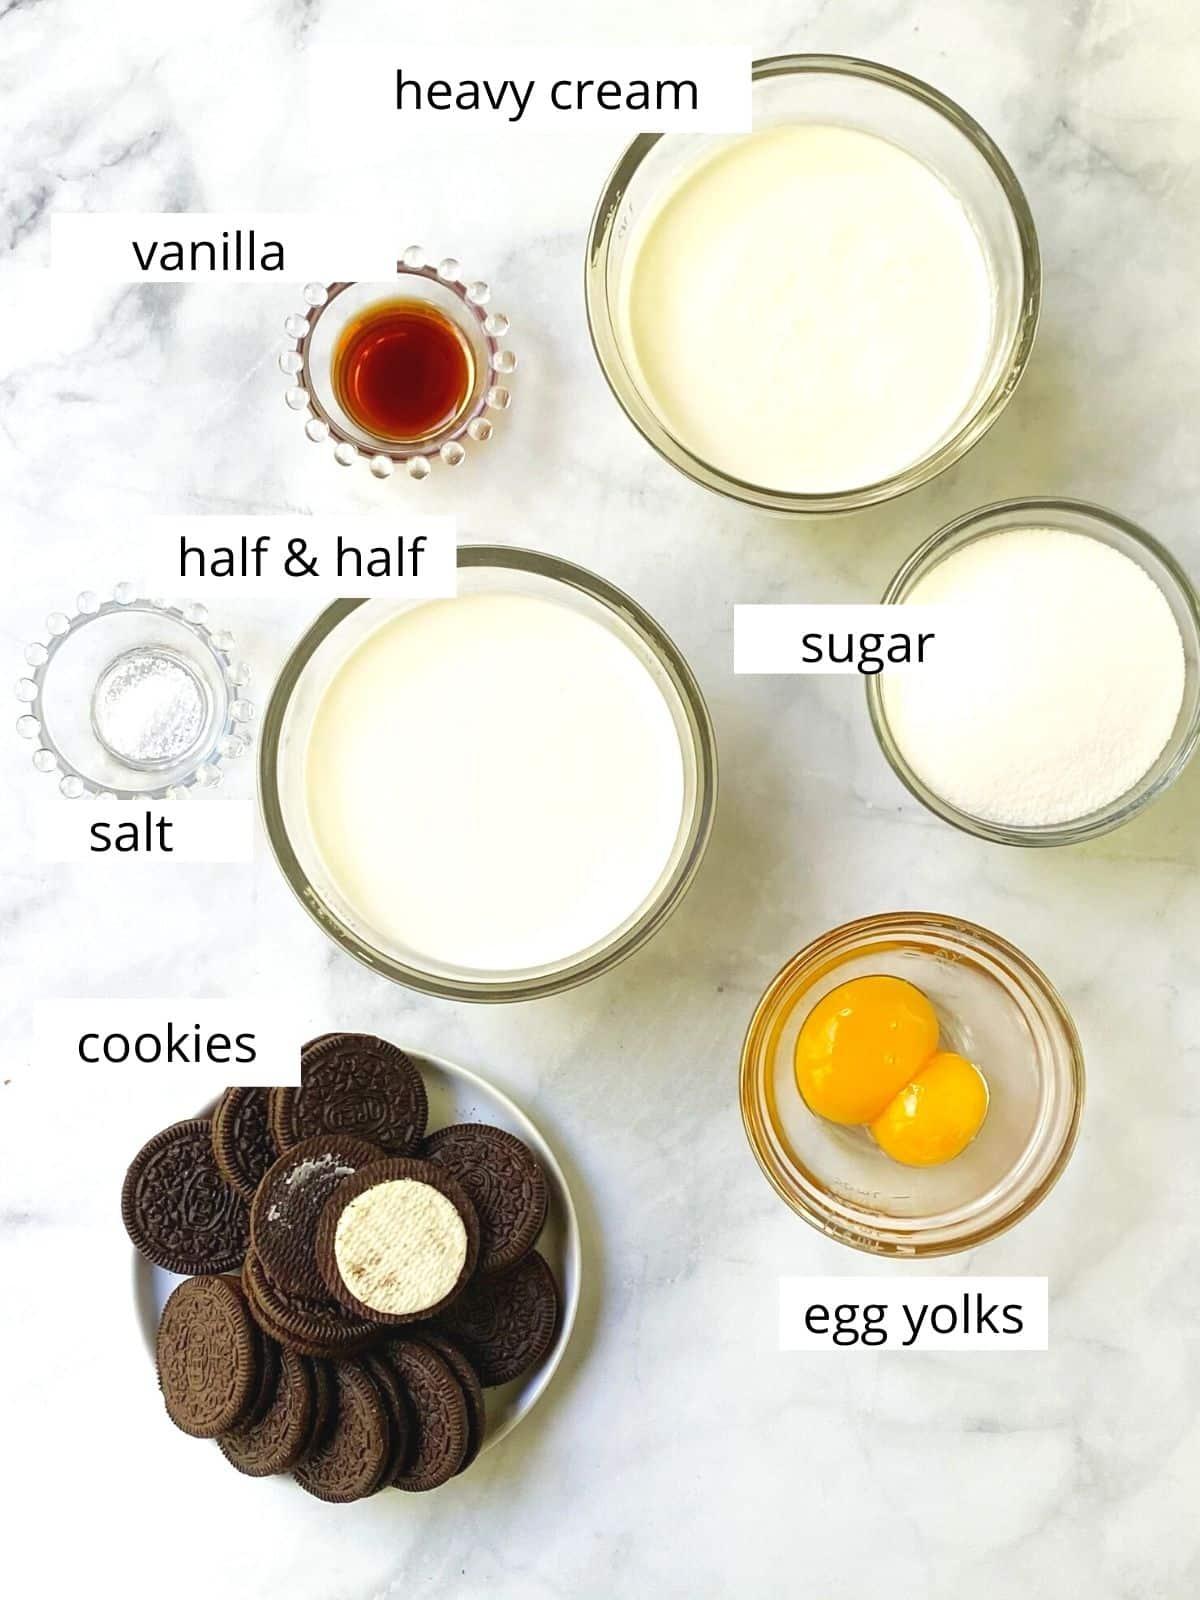 array of ingredients - cream, half and half, sugar, egg yolks, vanilla, salt, and cookies